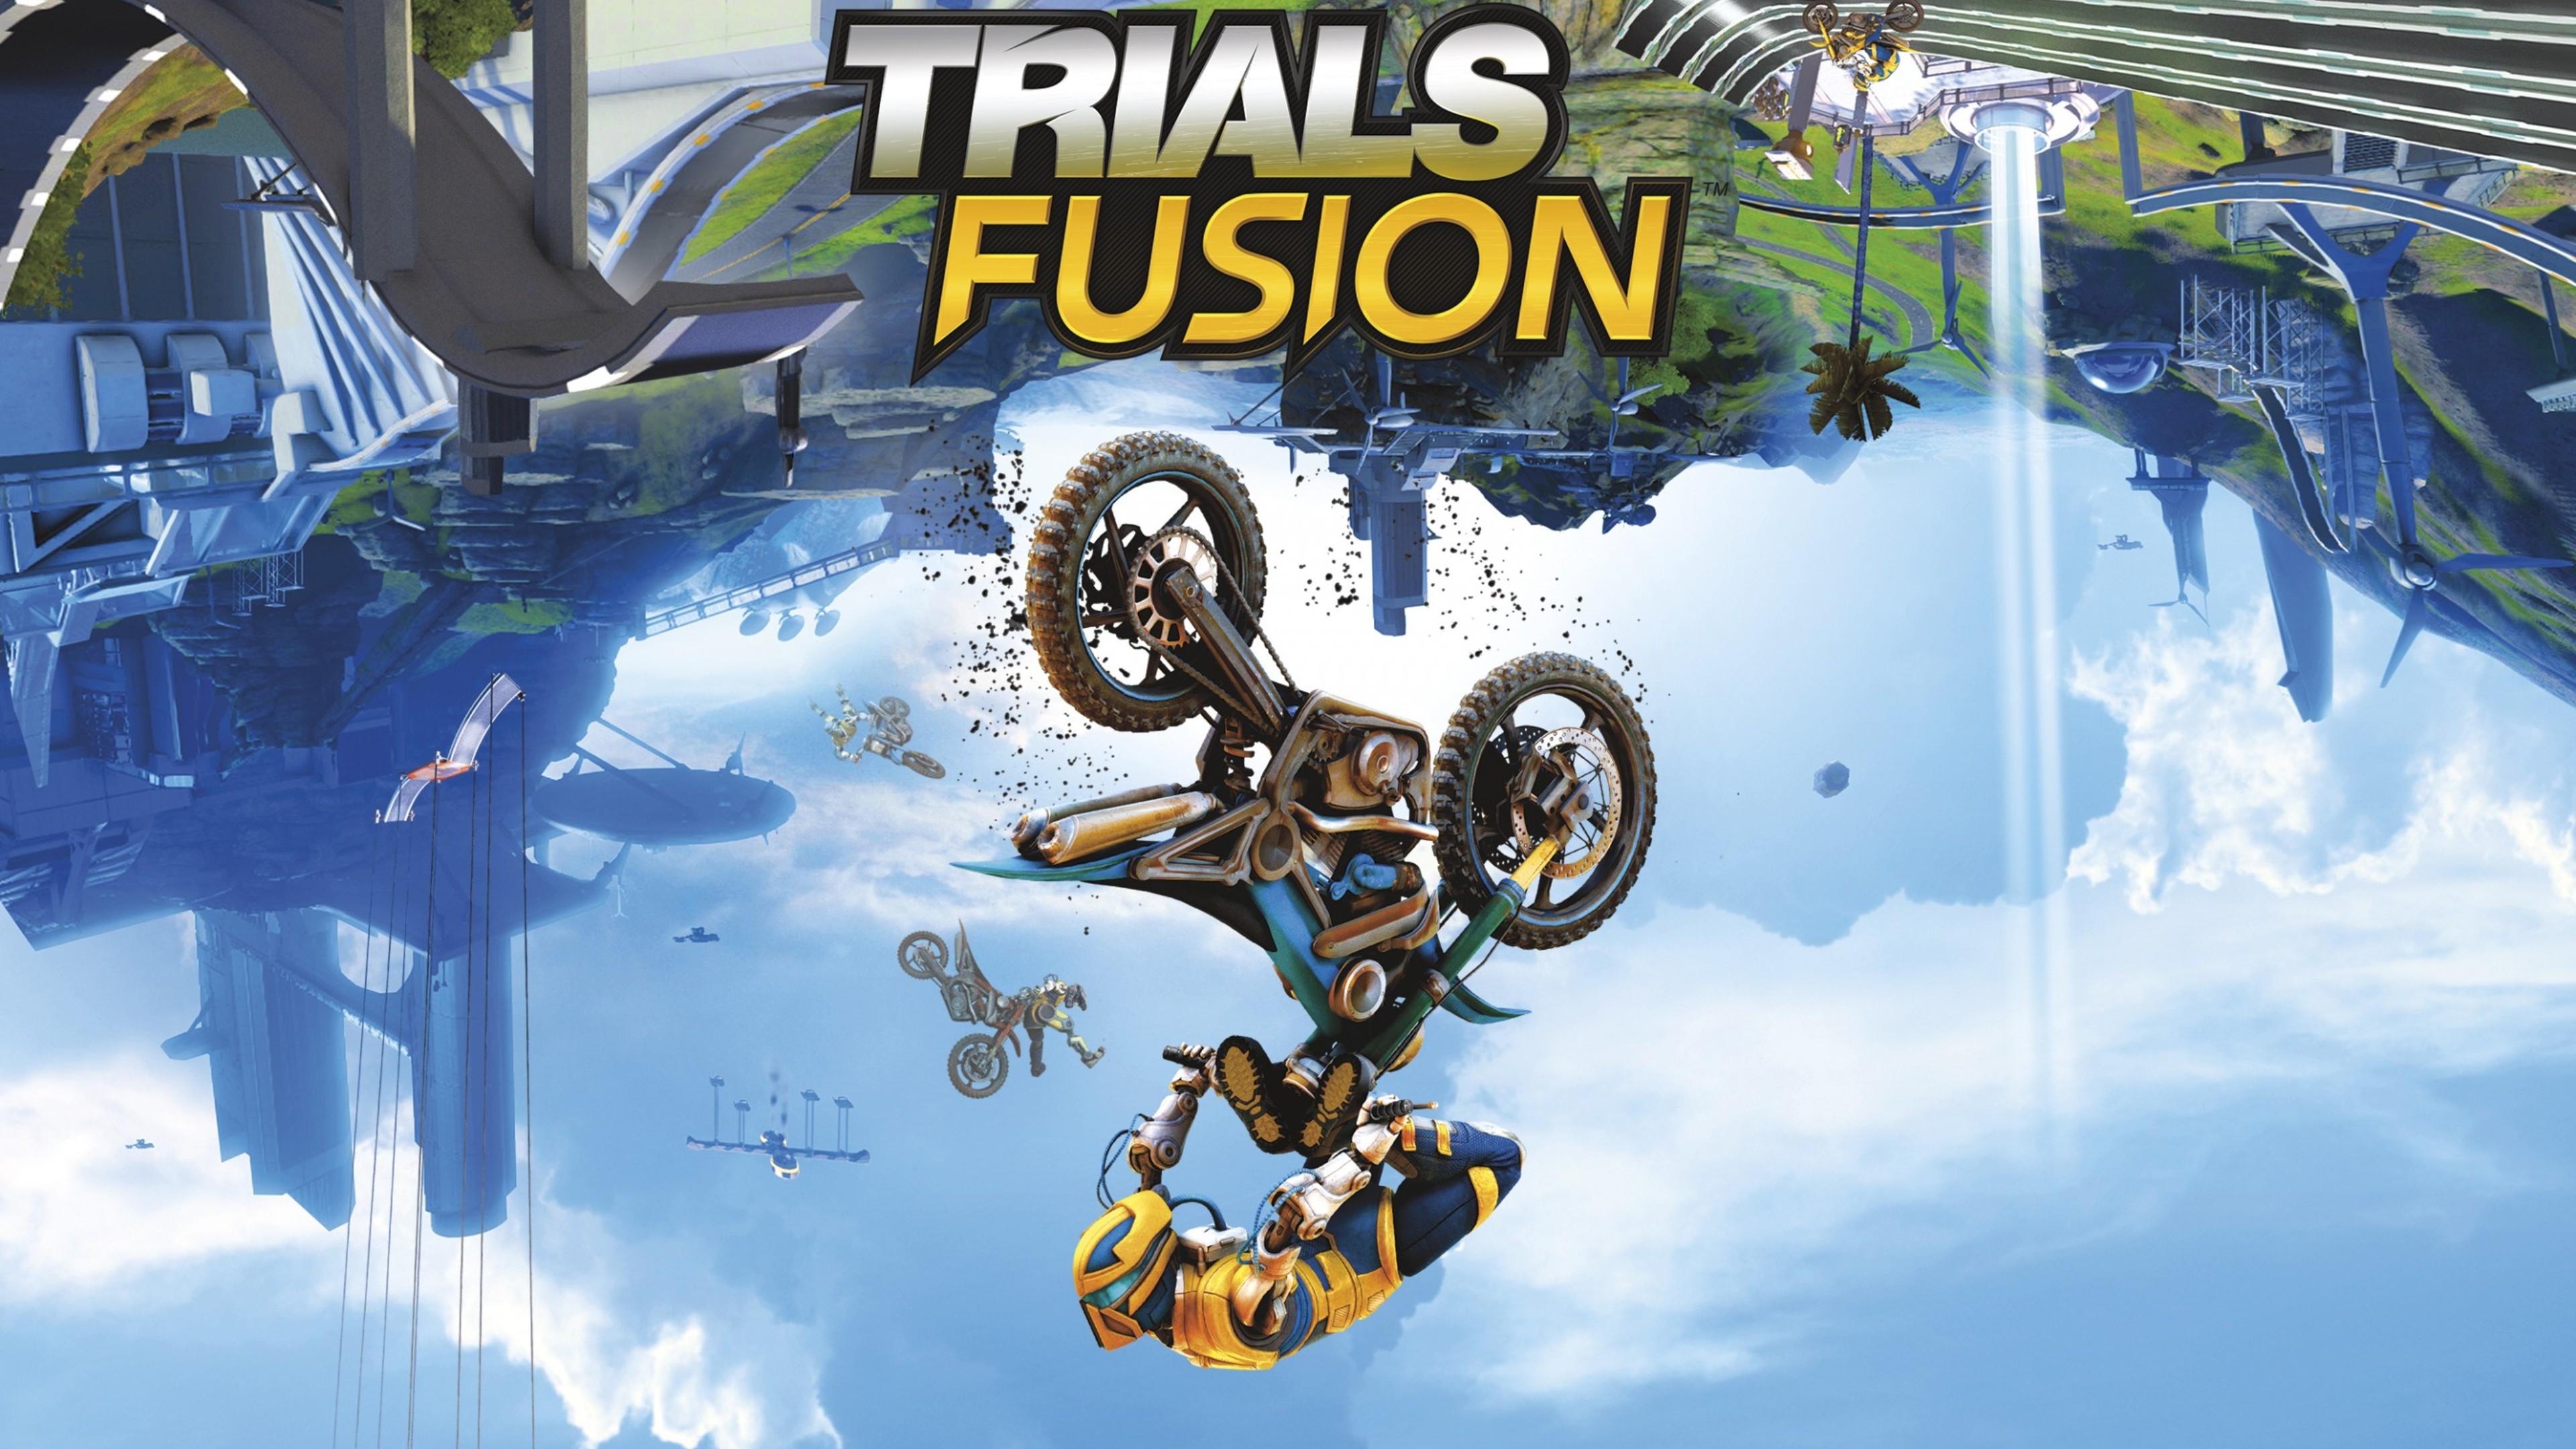 trials fusion game hd 1535967362 - Trials Fusion Game Hd - trials fusion wallpapers, games wallpapers